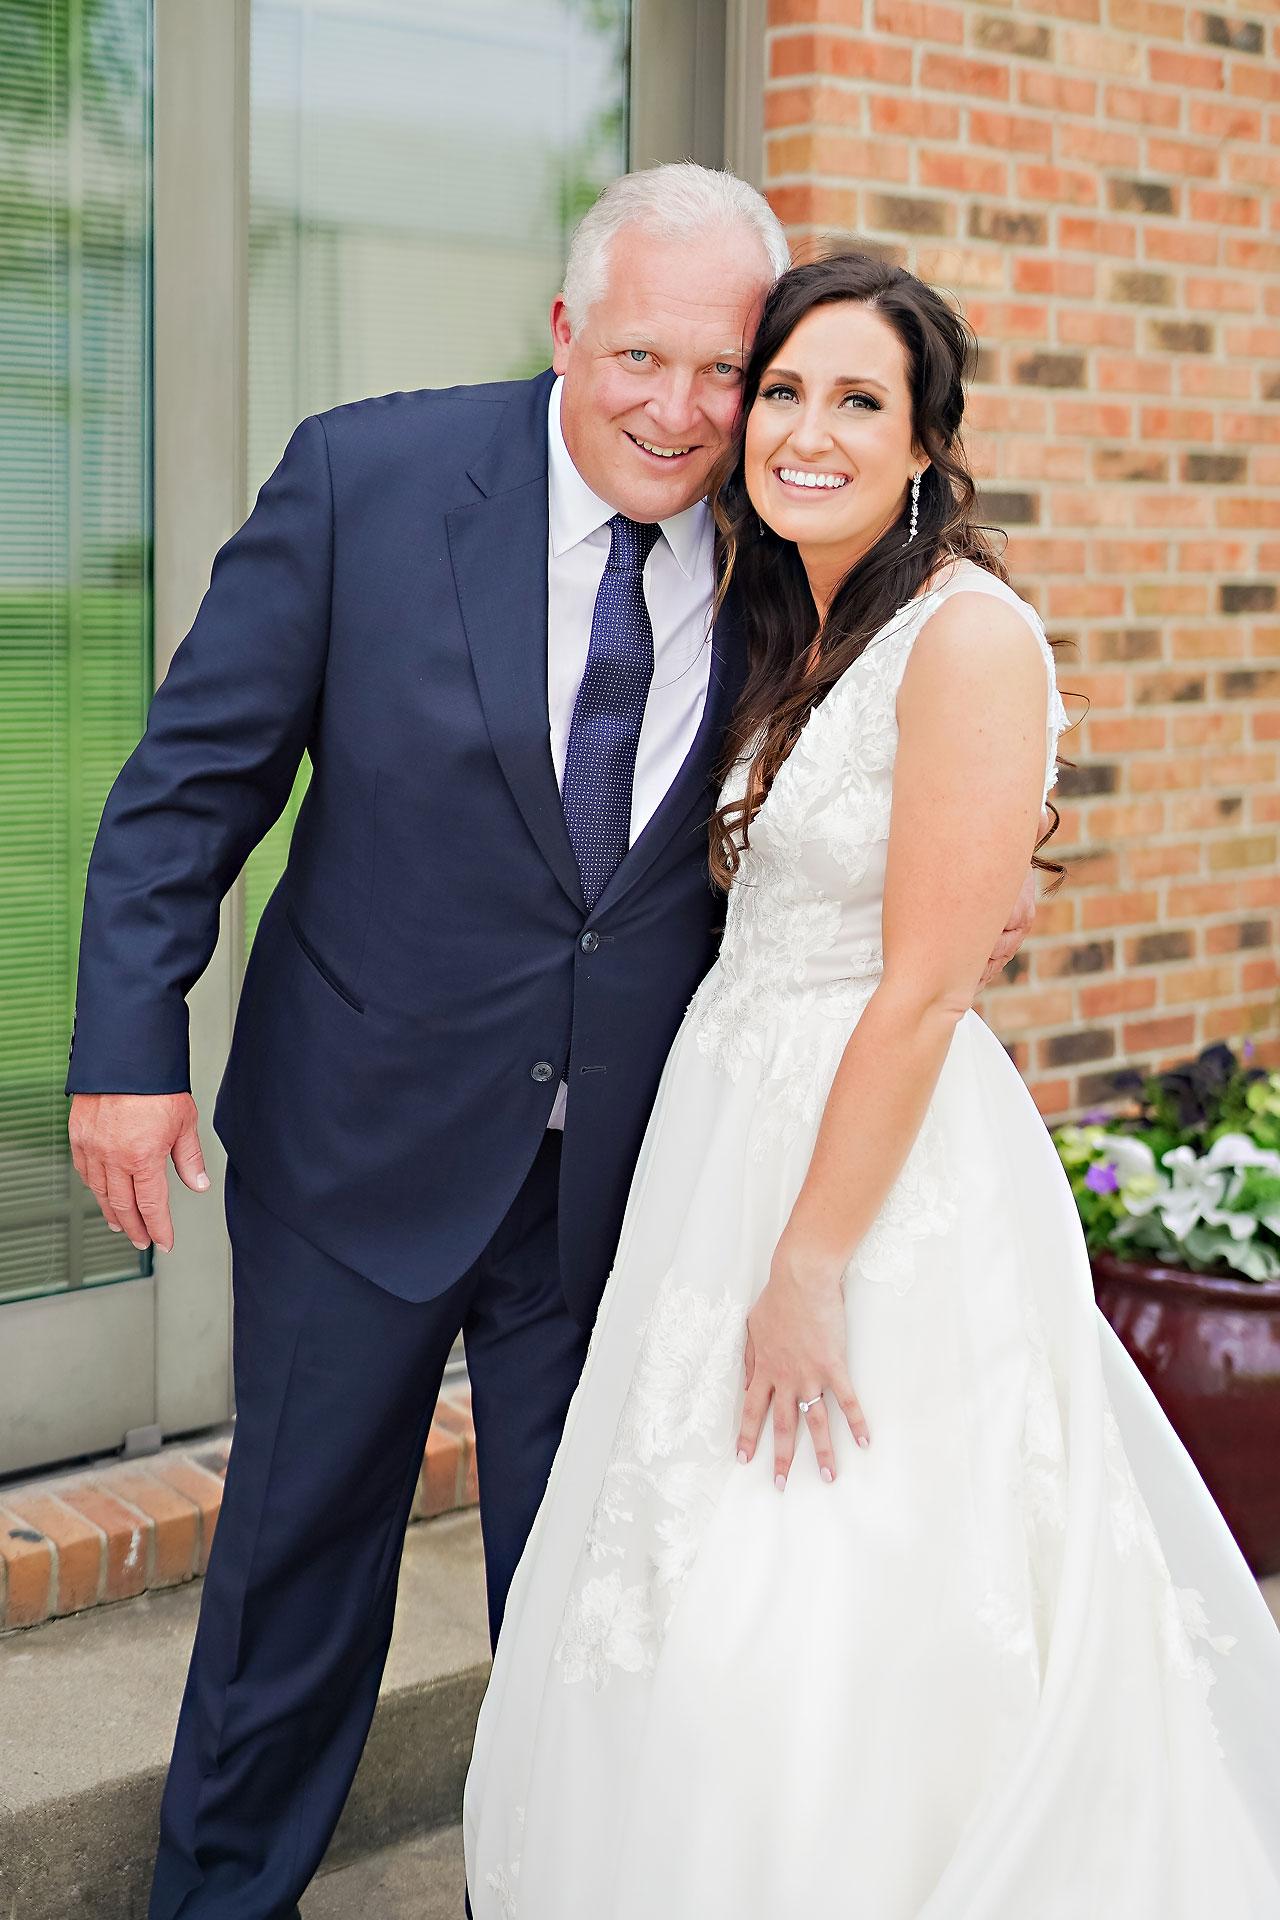 MacKinze John Lafayette Indiana Purdue Wedding 131